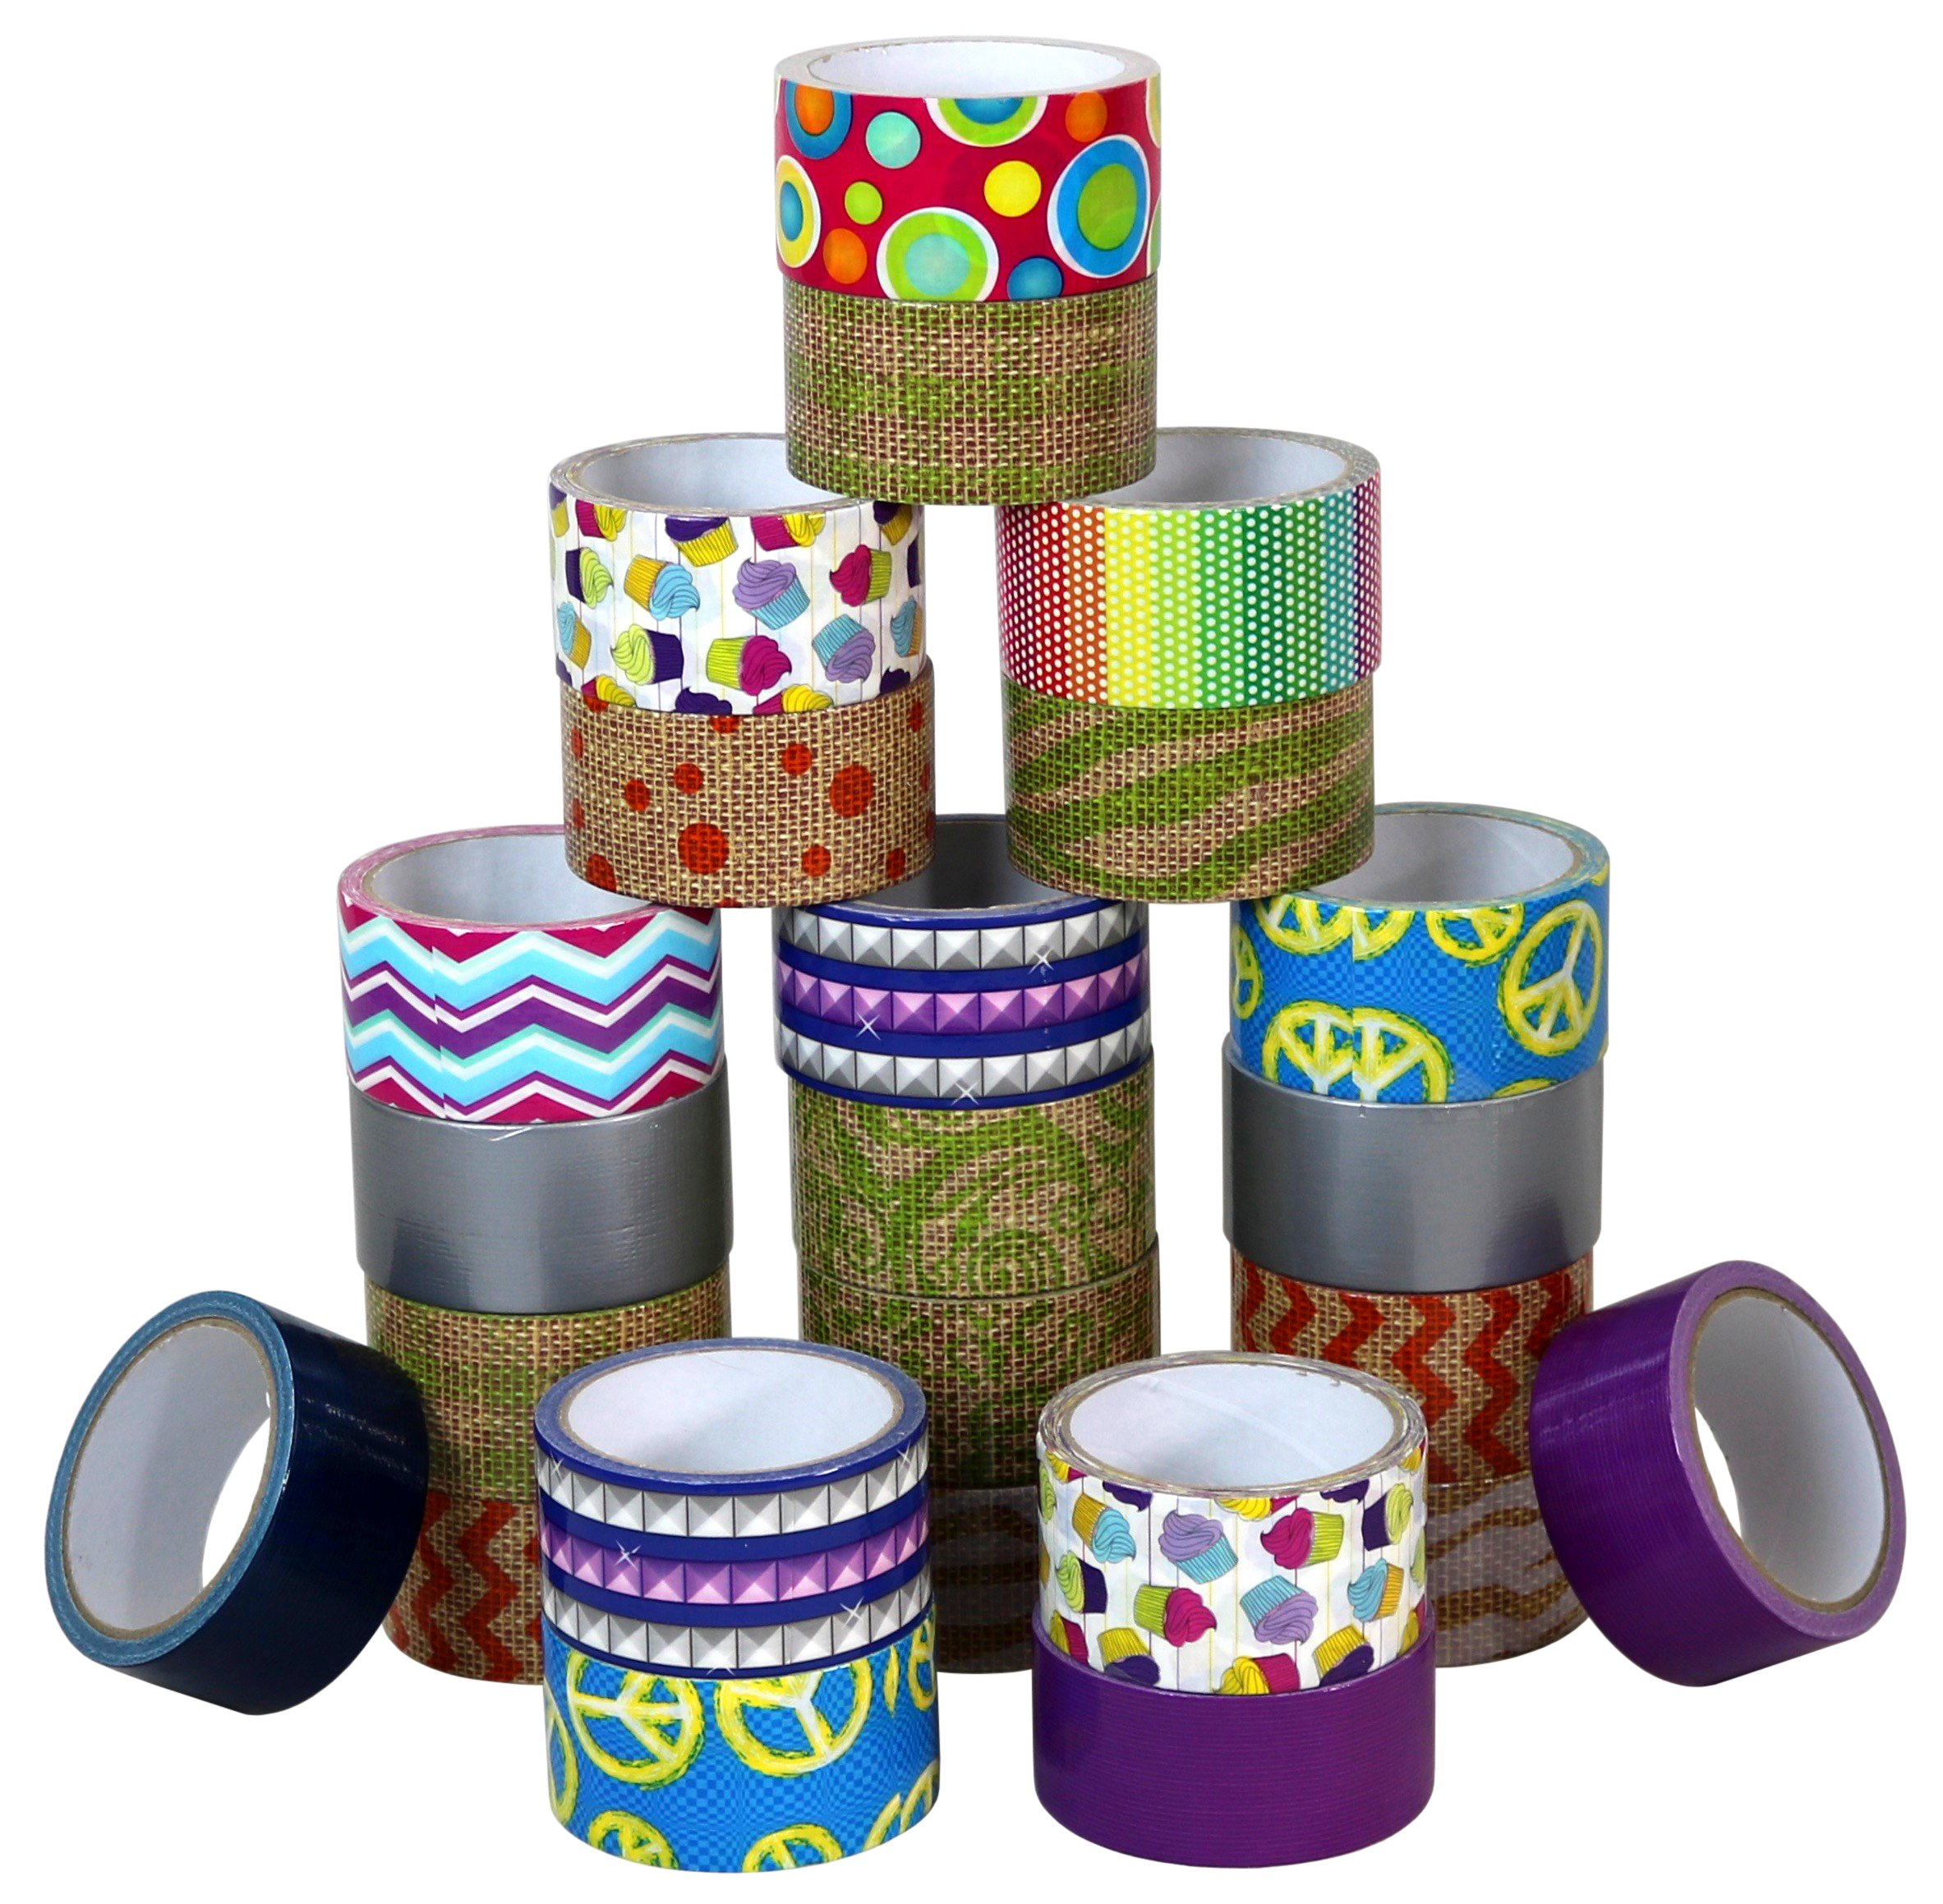 Assorted Duct Tape Bulk Set Of Colored Duct Tape, 24 Random Rolls